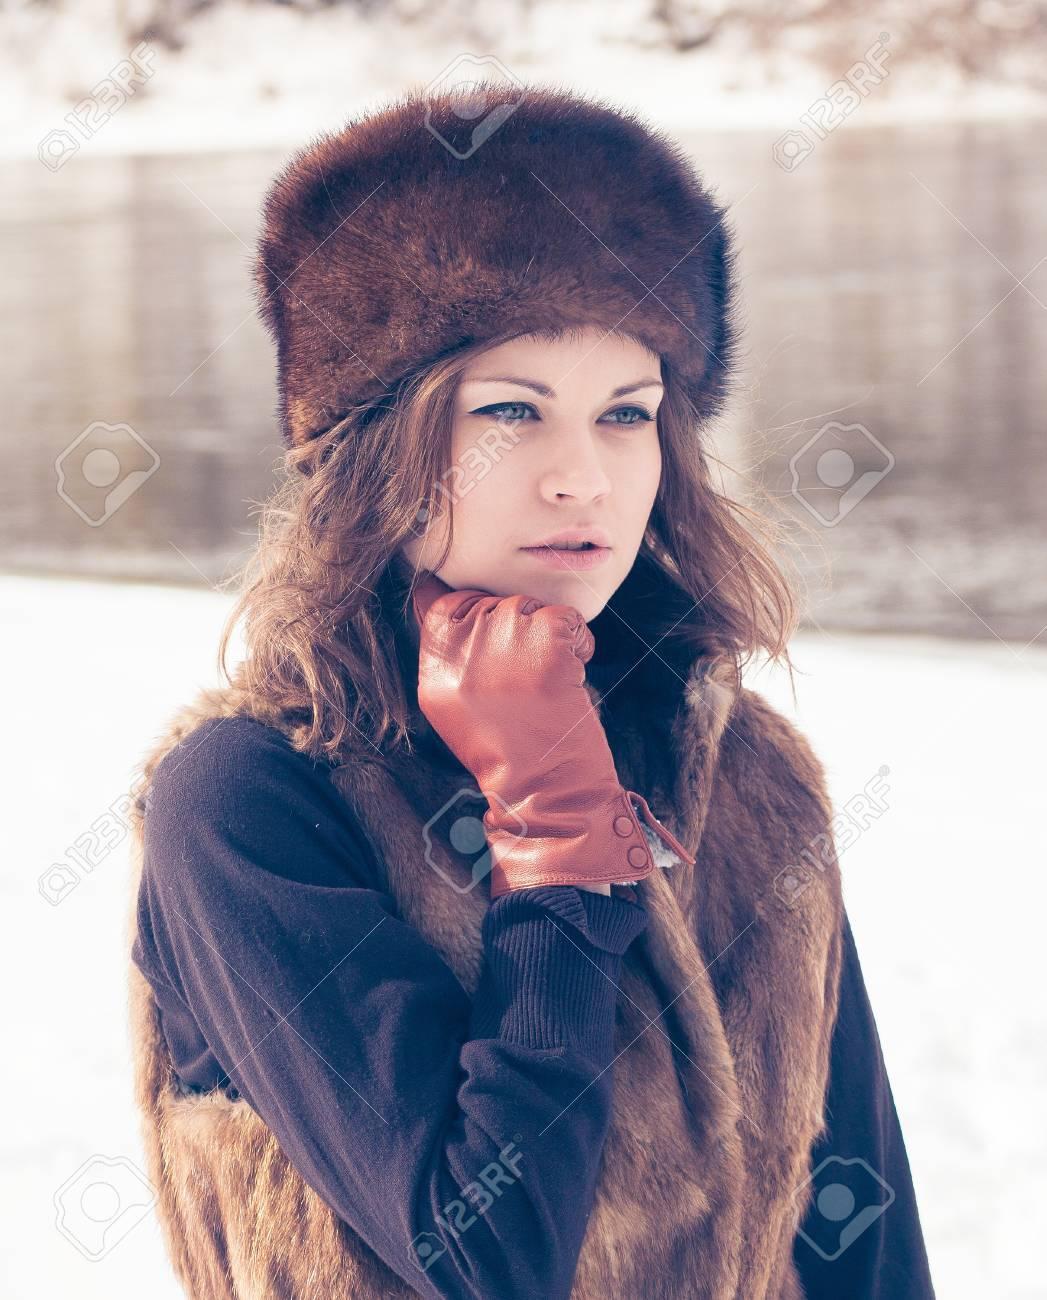 Portrait Of A Beautiful Girl In A Fur Hat